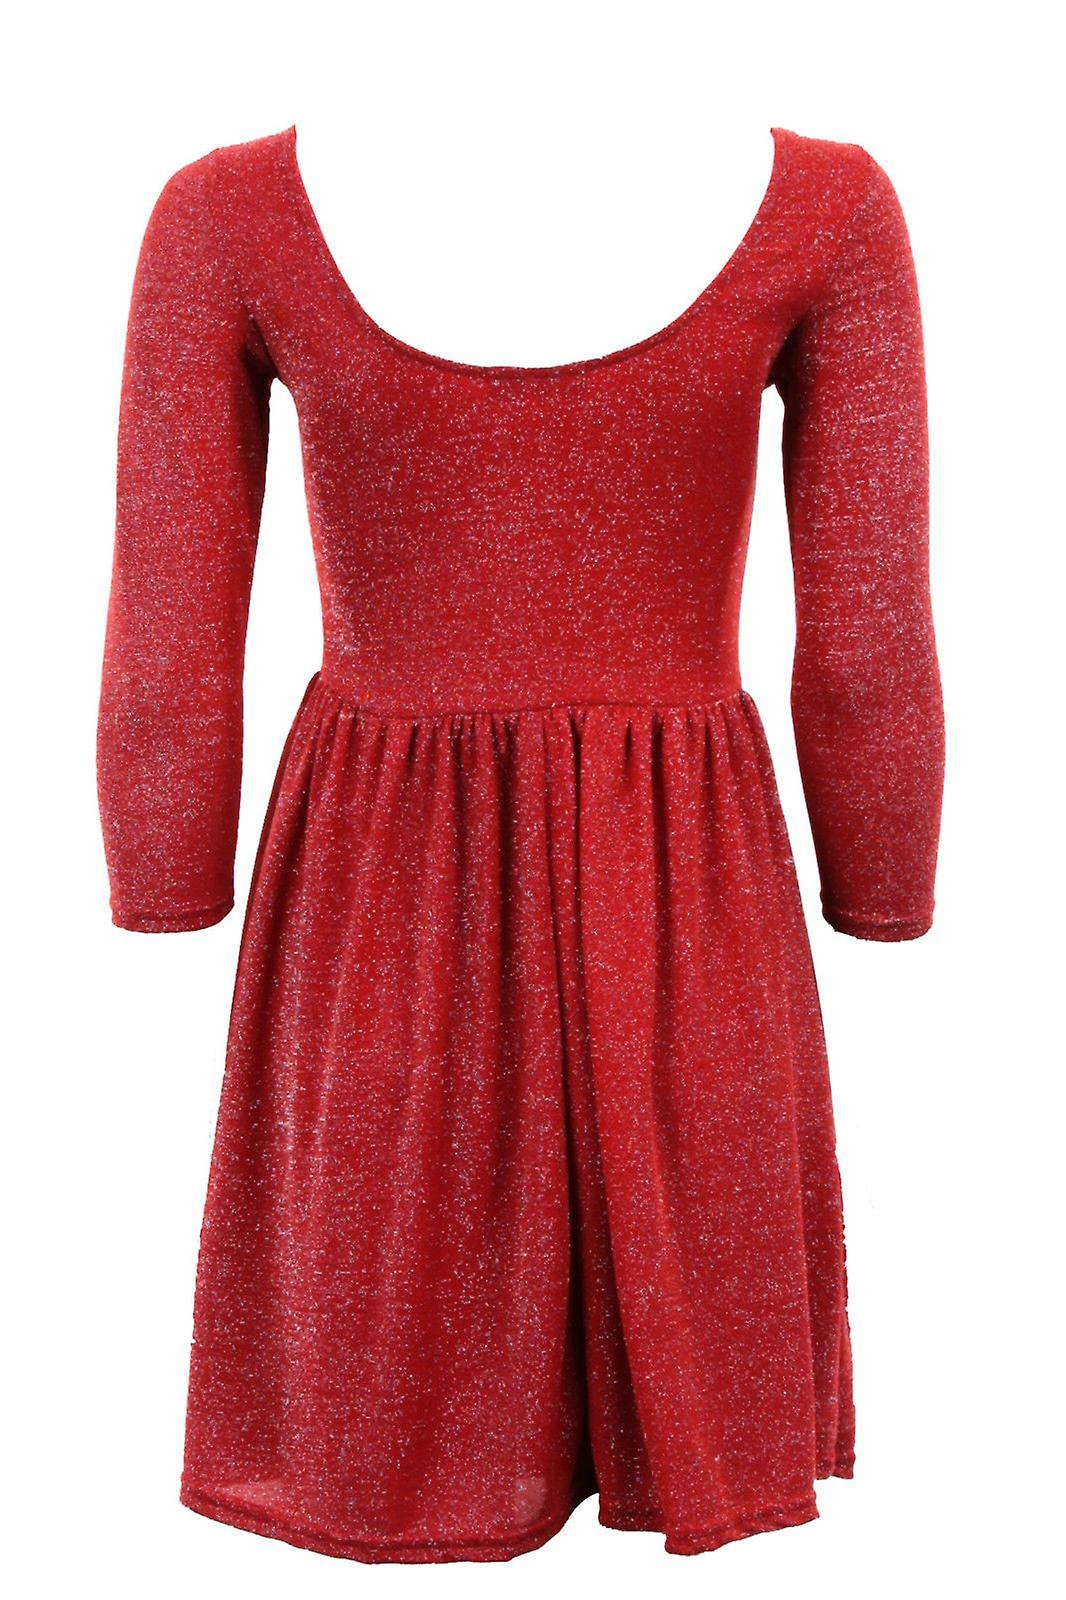 Ladies 3/4 Sleeve Lurex Shiny Low Back Pleated Skater Short Women's Dress